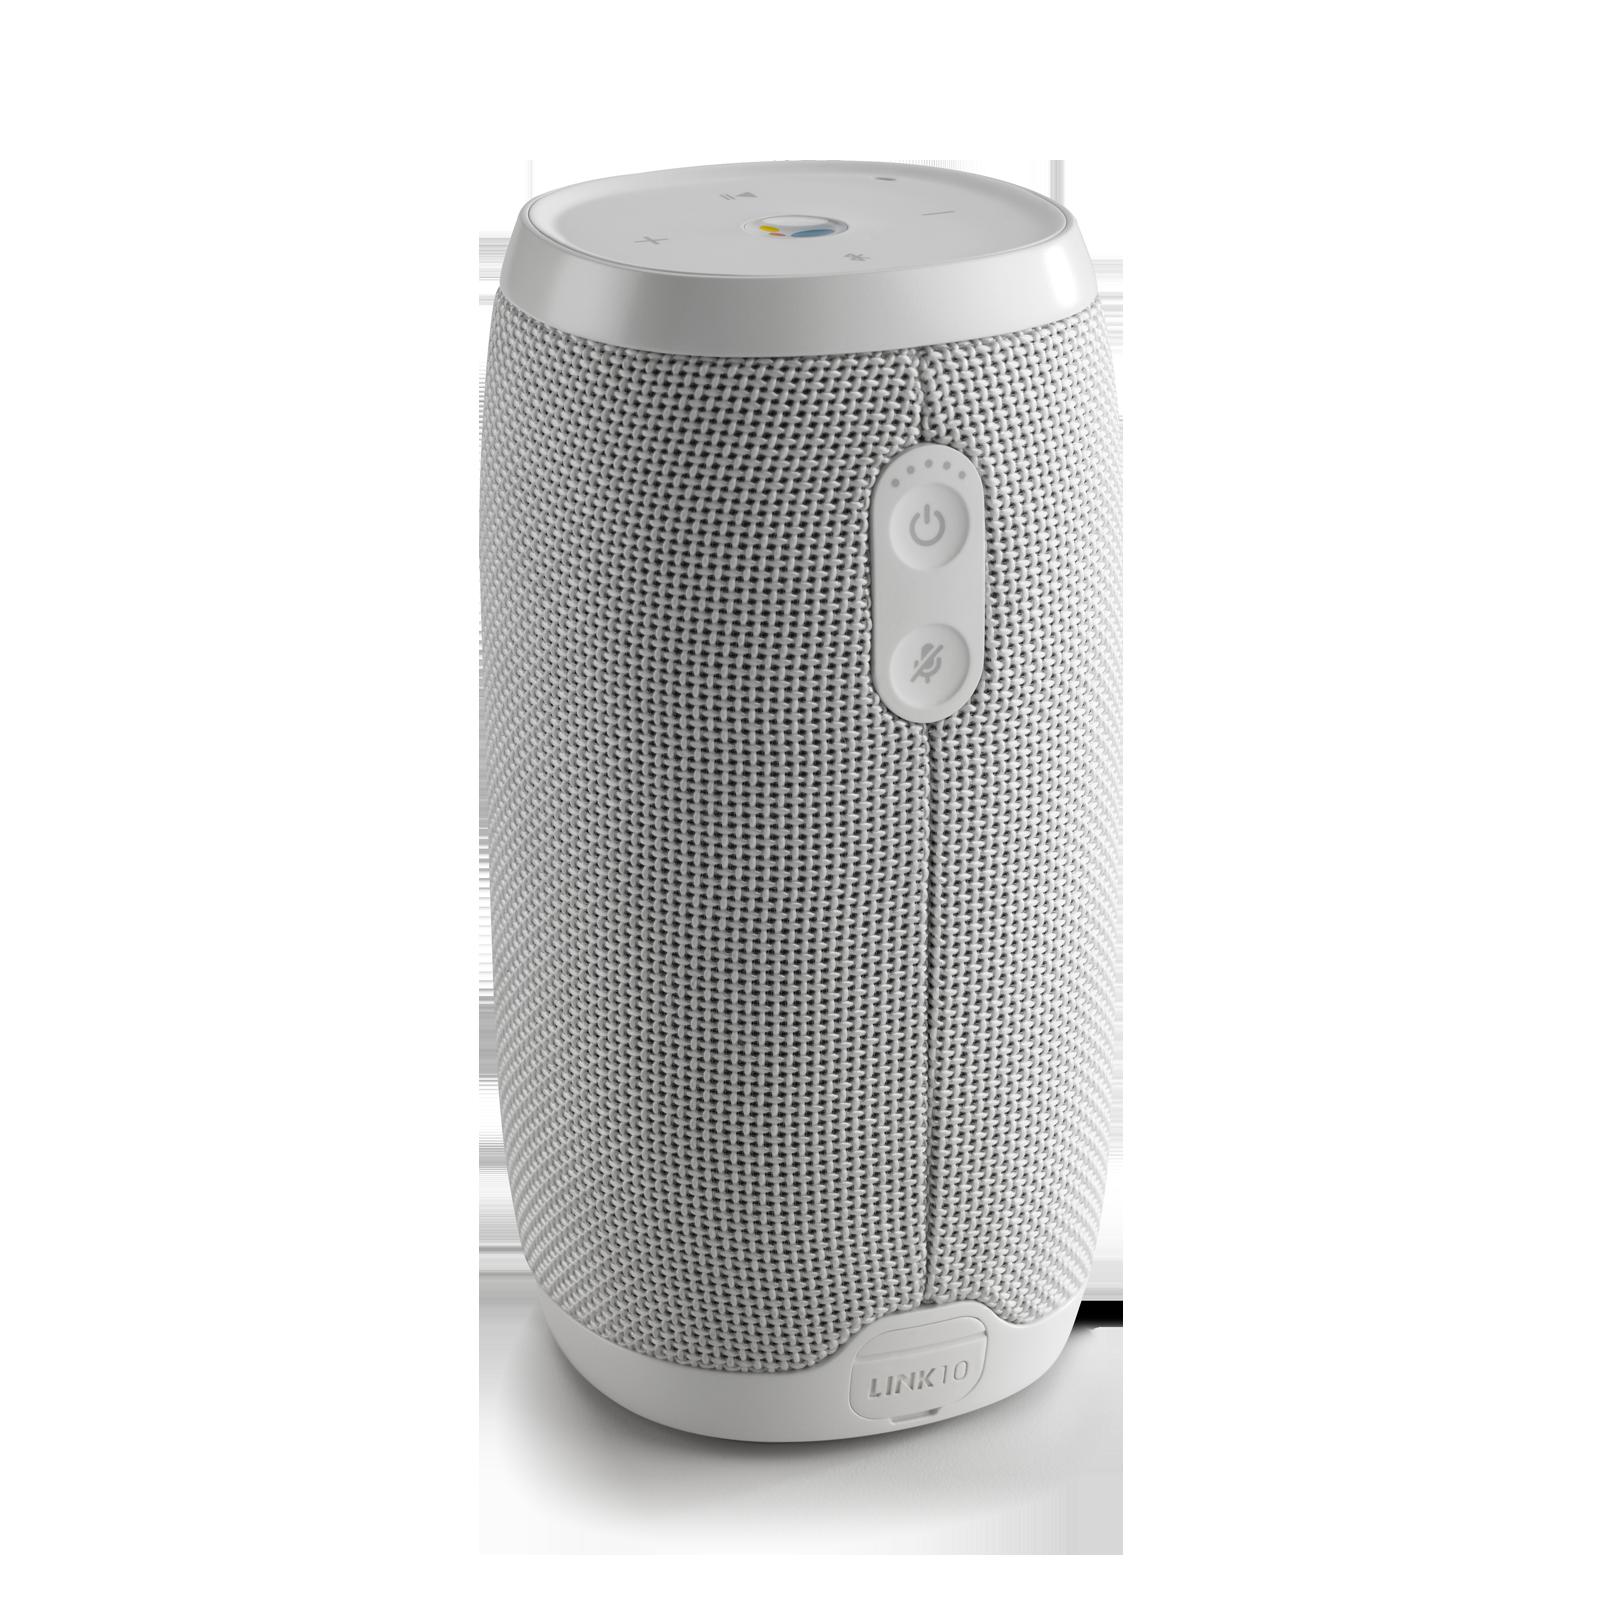 JBL Link 10 - White - Voice-activated portable speaker - Back